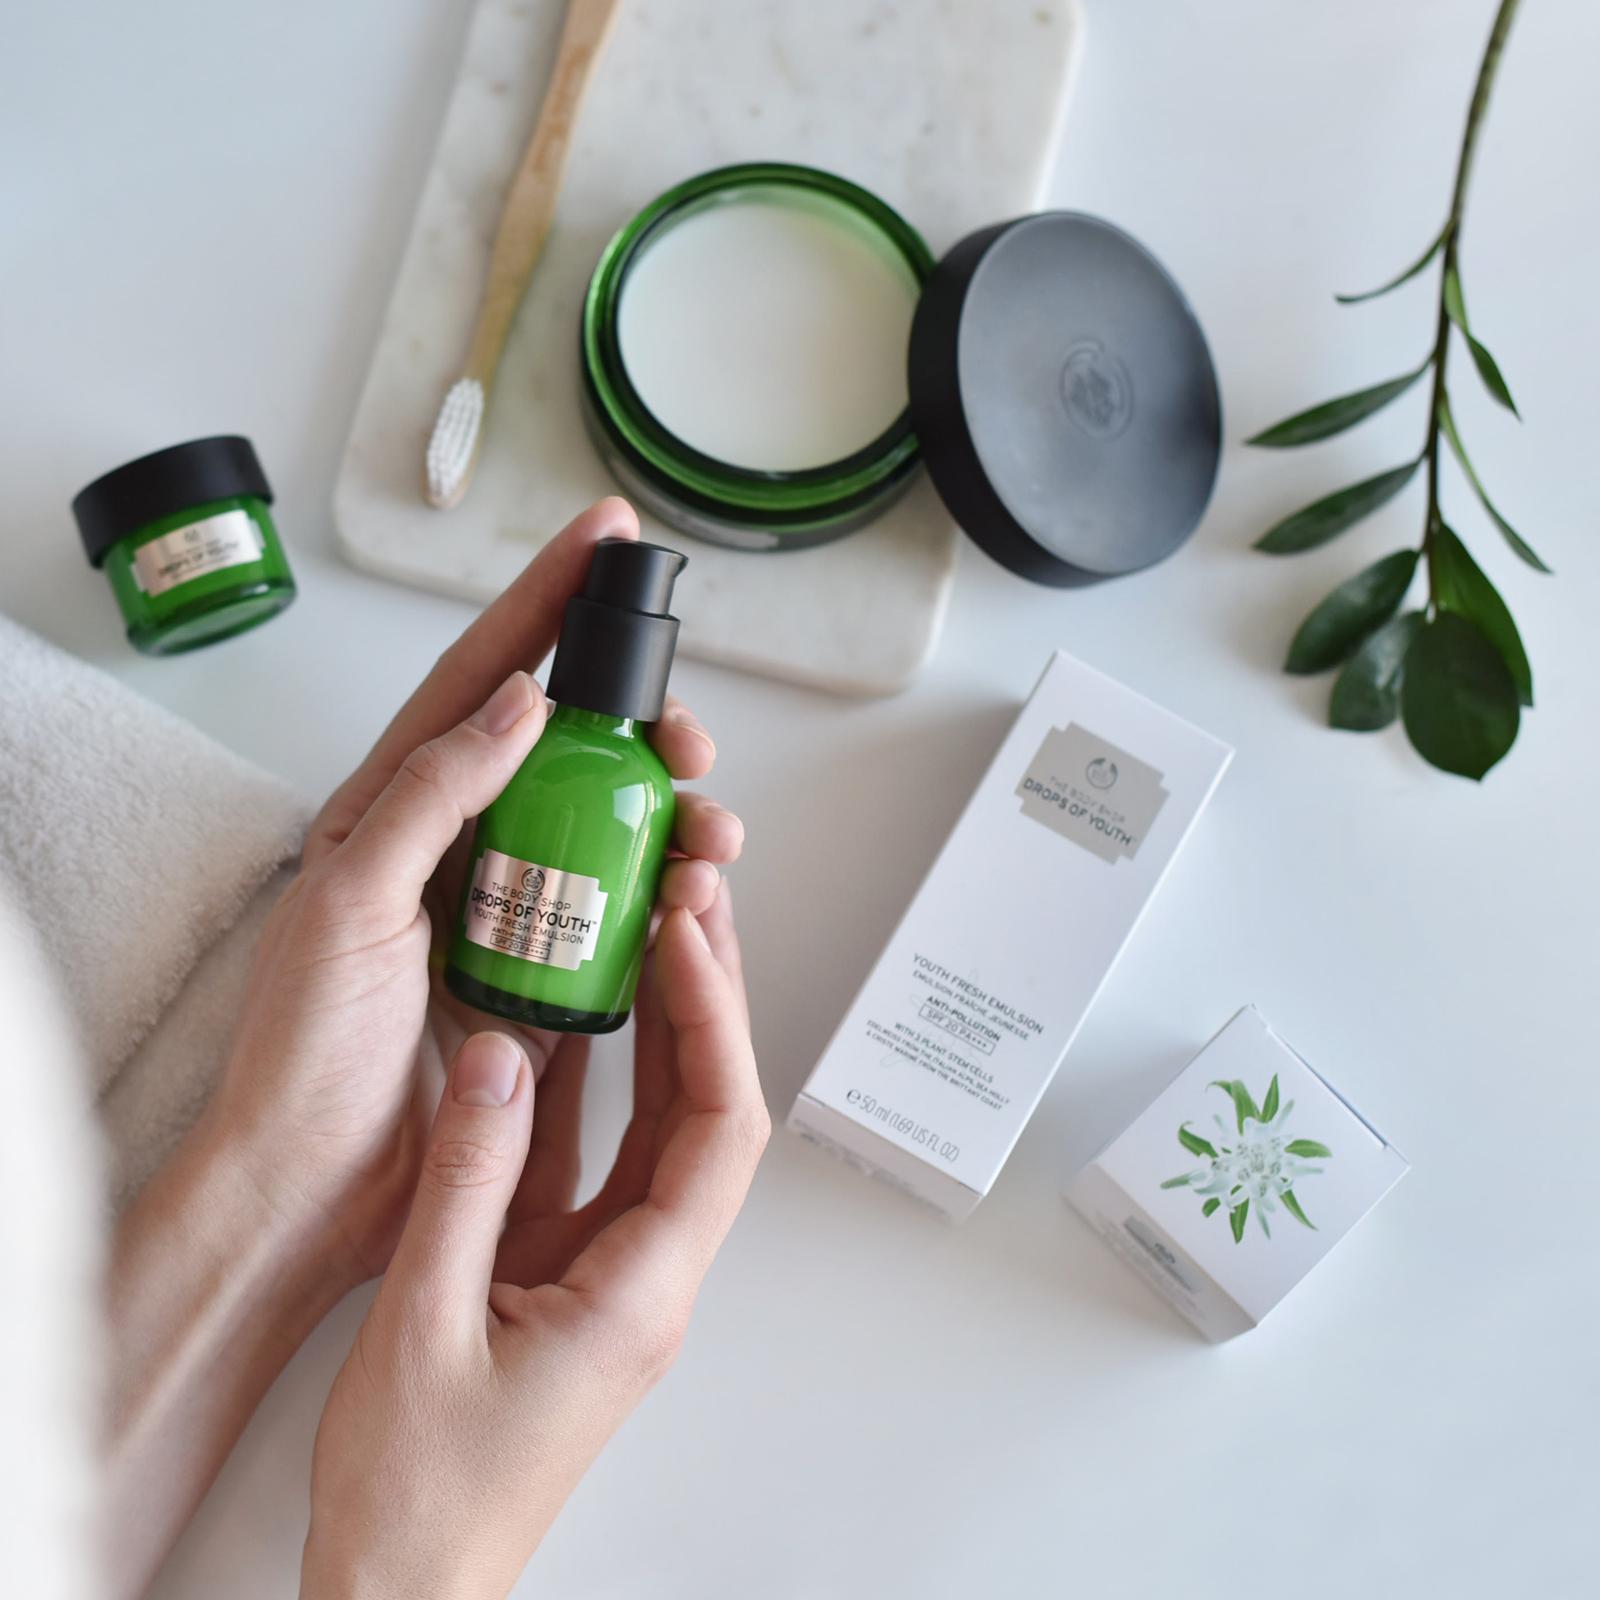 Advertisement for The Body Shop  https://www.instagram.com/thebodyshop/